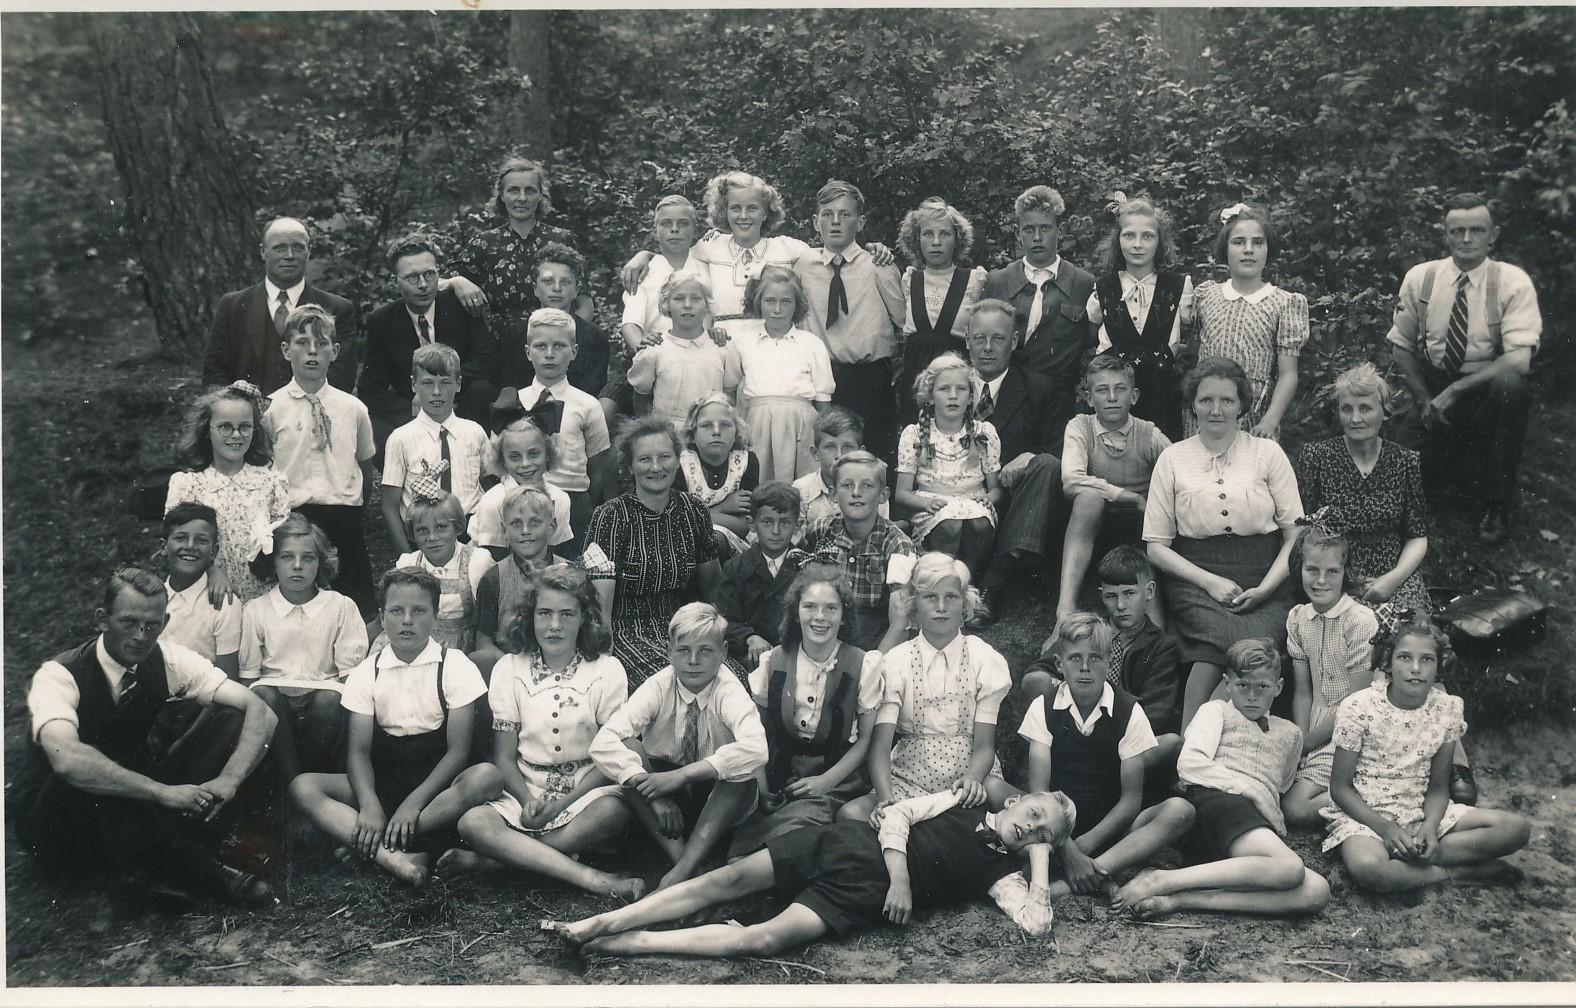 Fotoalbum Andre Kamsma, 029, Skoalfoto, 1941-1942